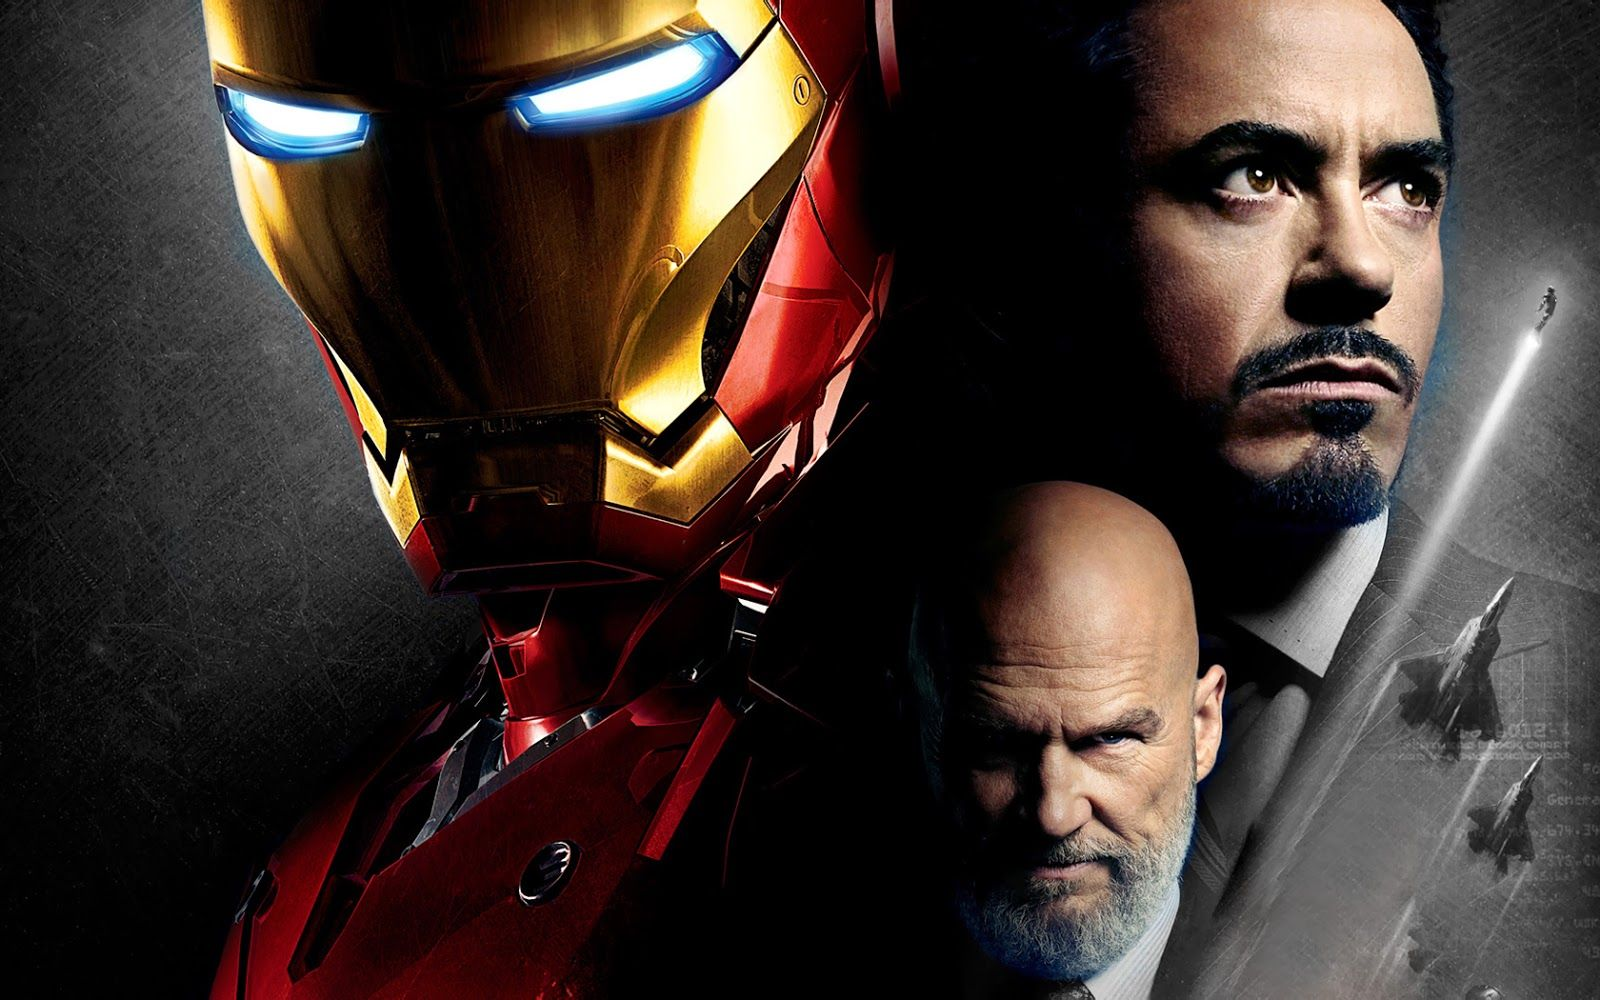 iron man 3 movie   download this free iron man 3 movie desktop